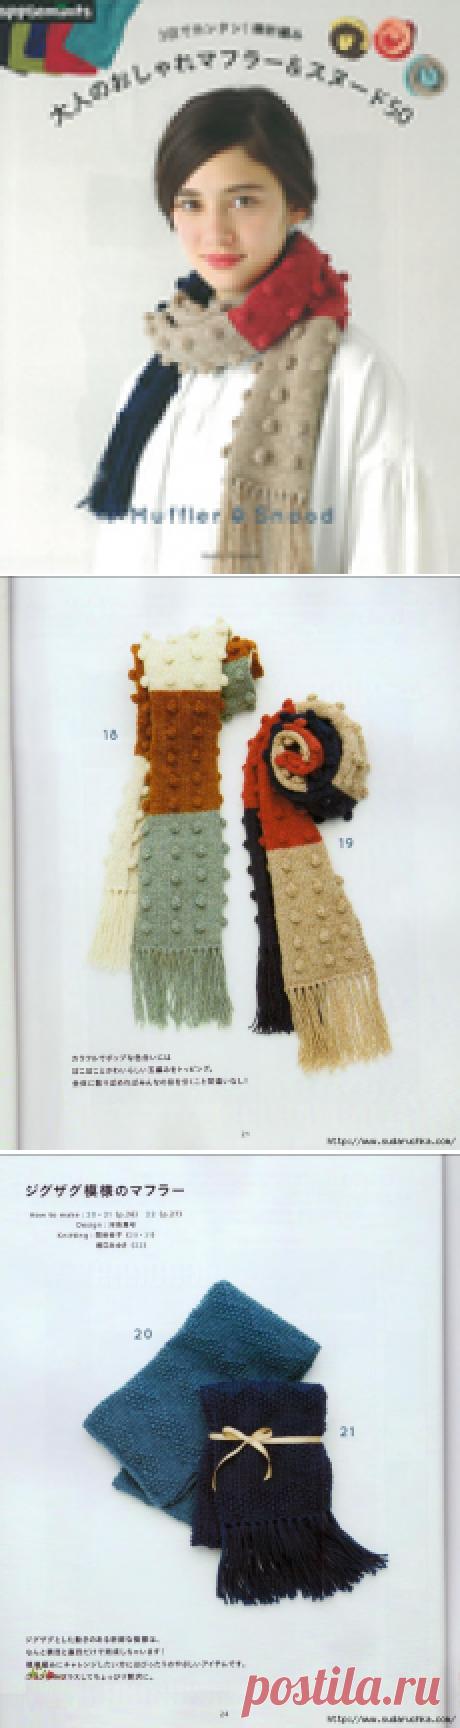 Muffler & Snood. Журнал по вязанию.